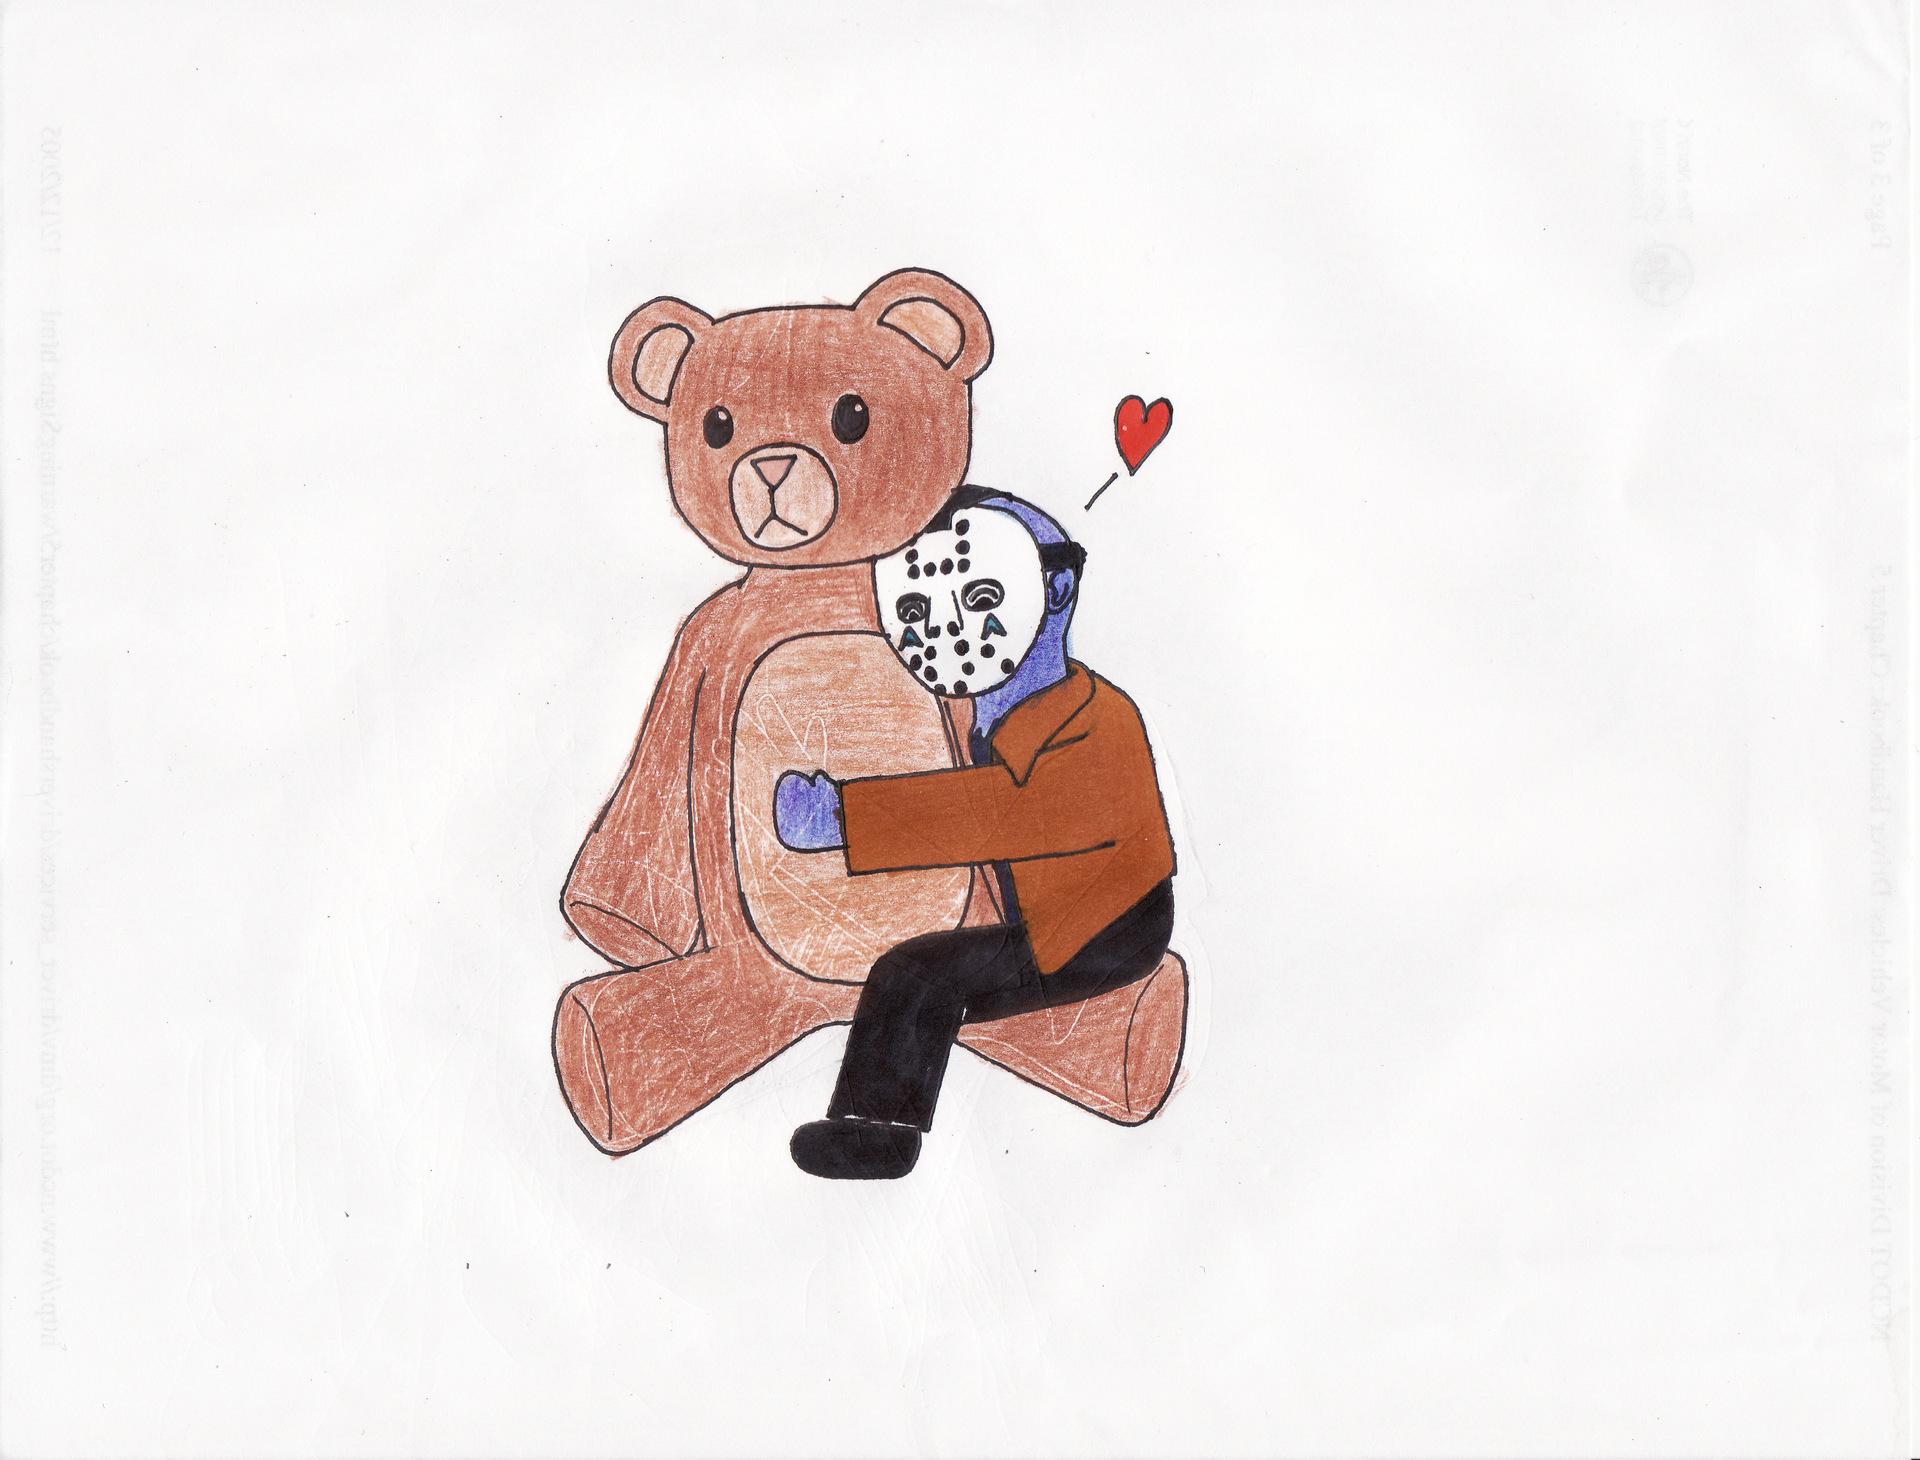 चीबी Jason's Teddy